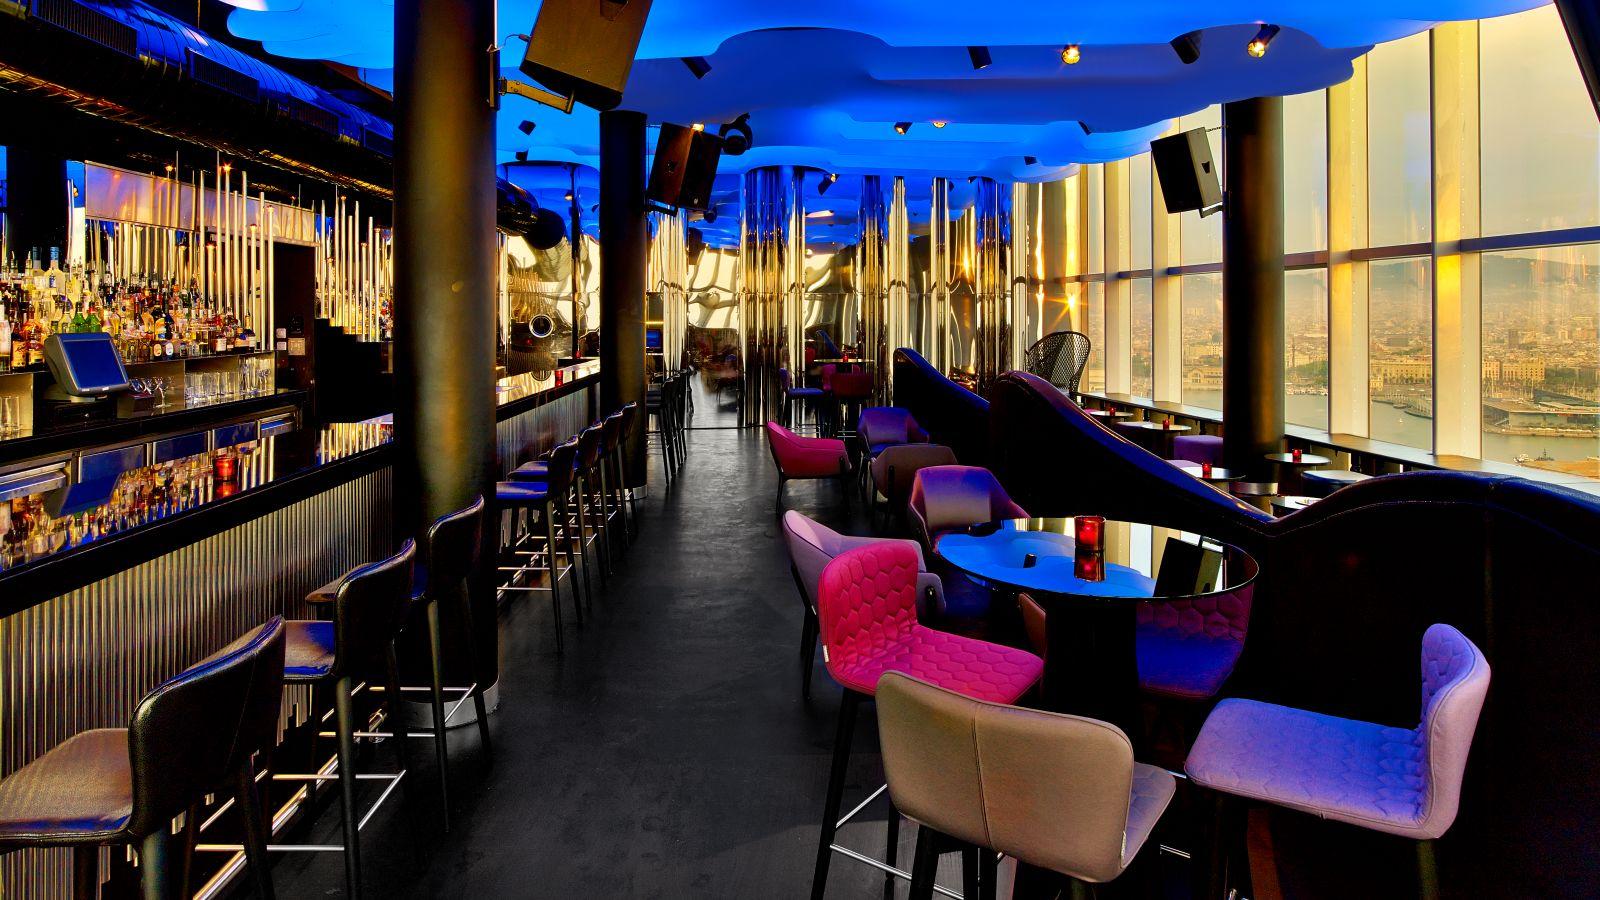 W Hotel Barcelona http://missadventures.ca/eclipse-bar-the-w-hotel-barcelona/